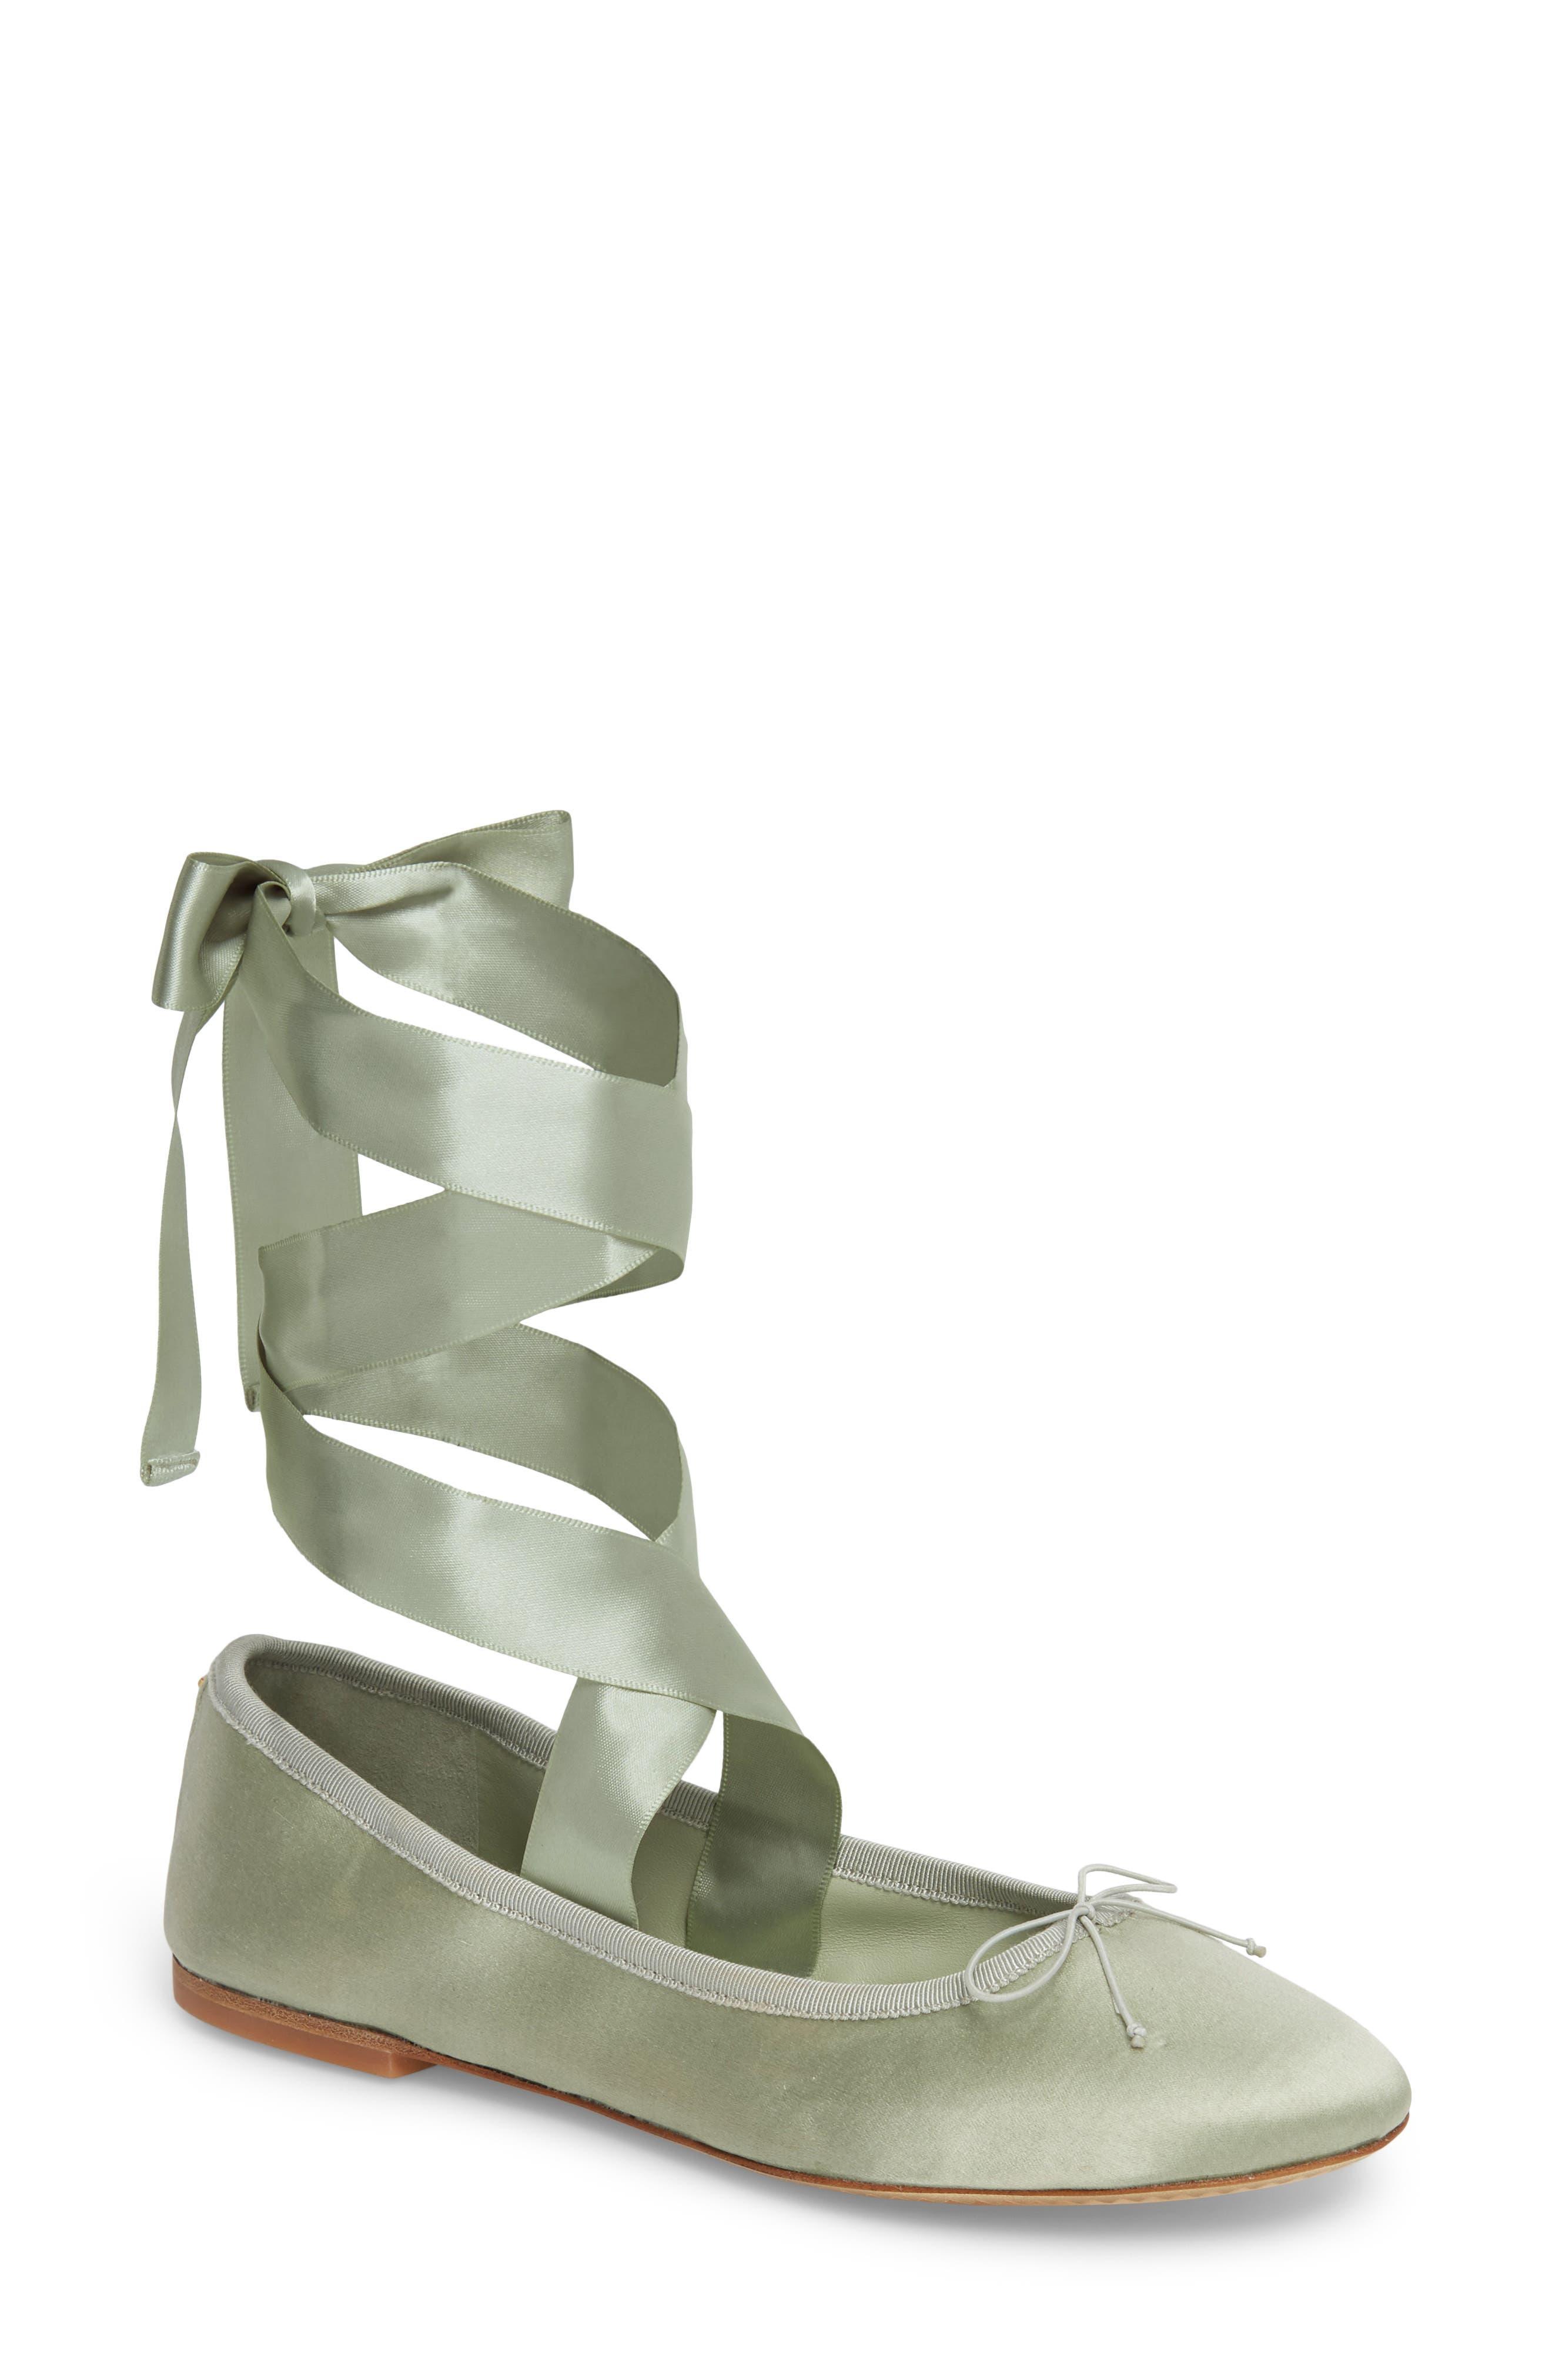 Tory Burch Elodie Lace-Up Ballet Flat (Women)